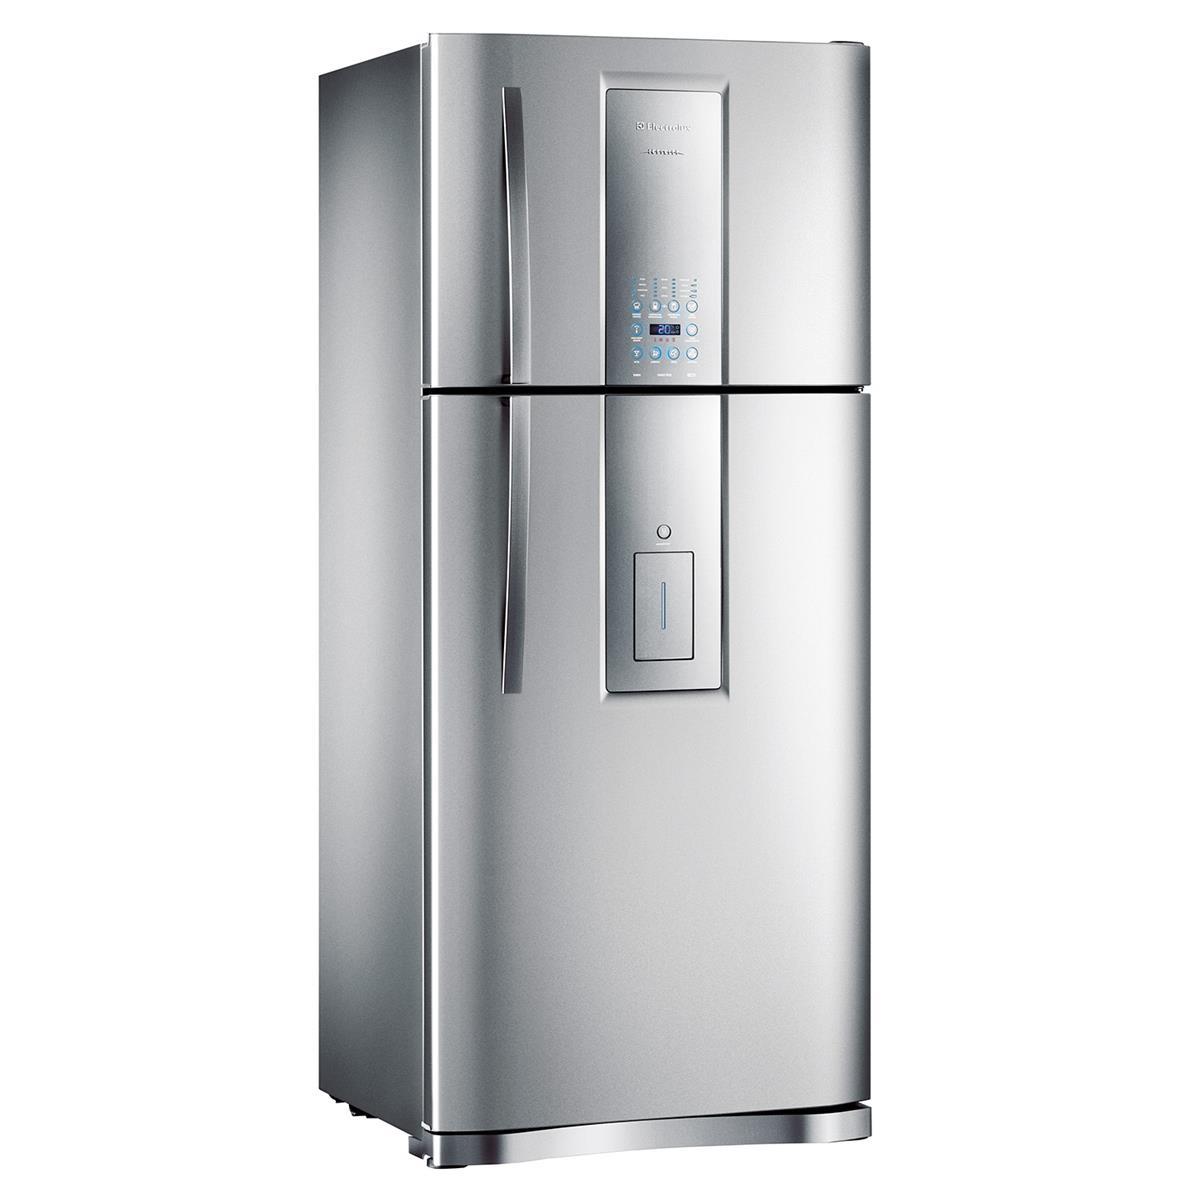 Refrigerador Infinity Frost Free 2 Portas 542L Inox Di80x Electrolux